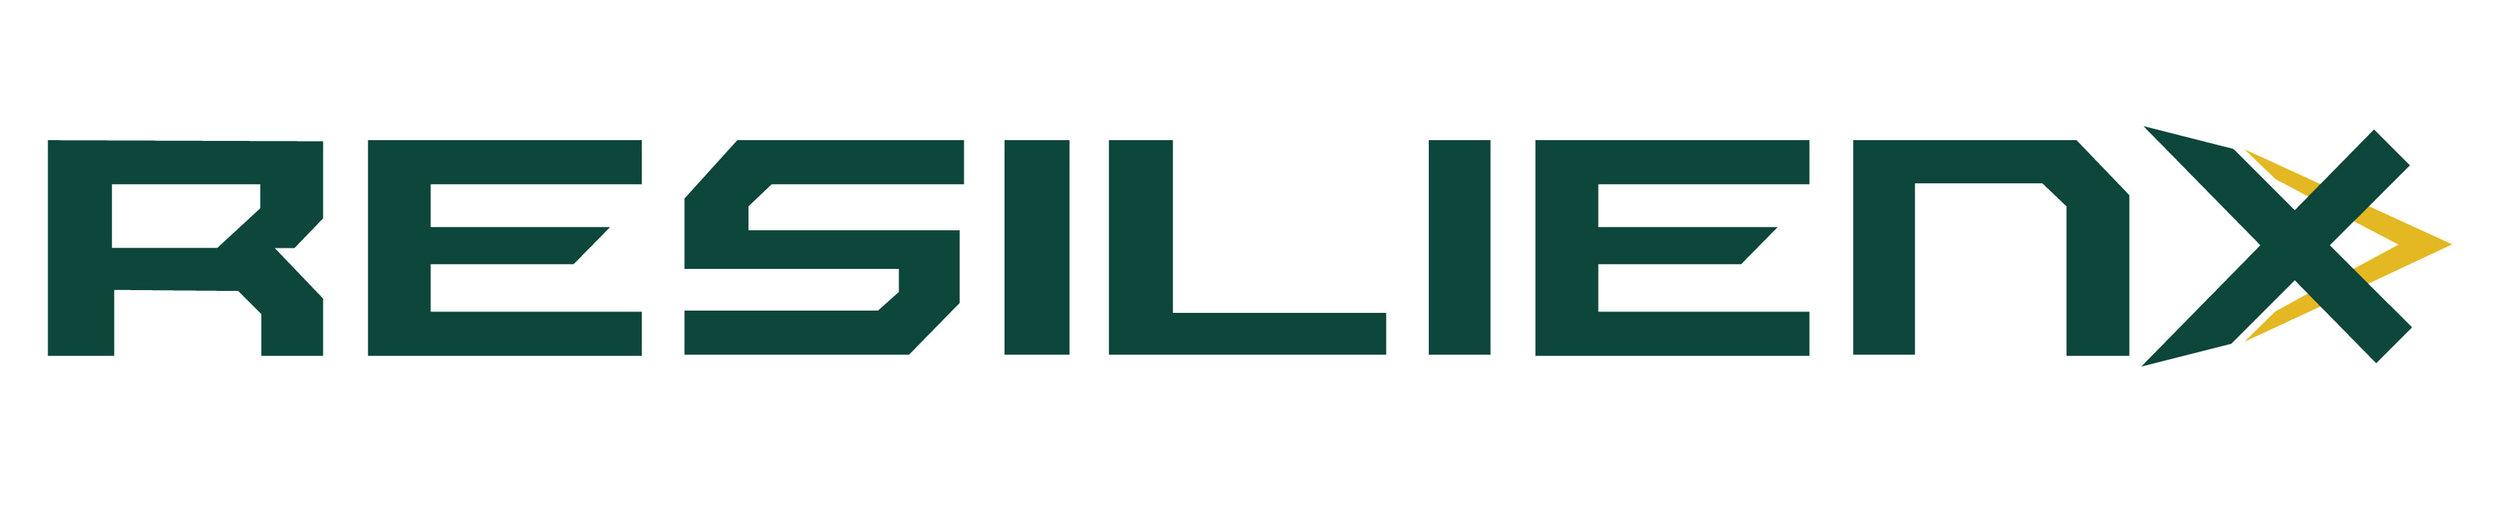 resilienx-logo-colorrgb-1118_orig.jpg